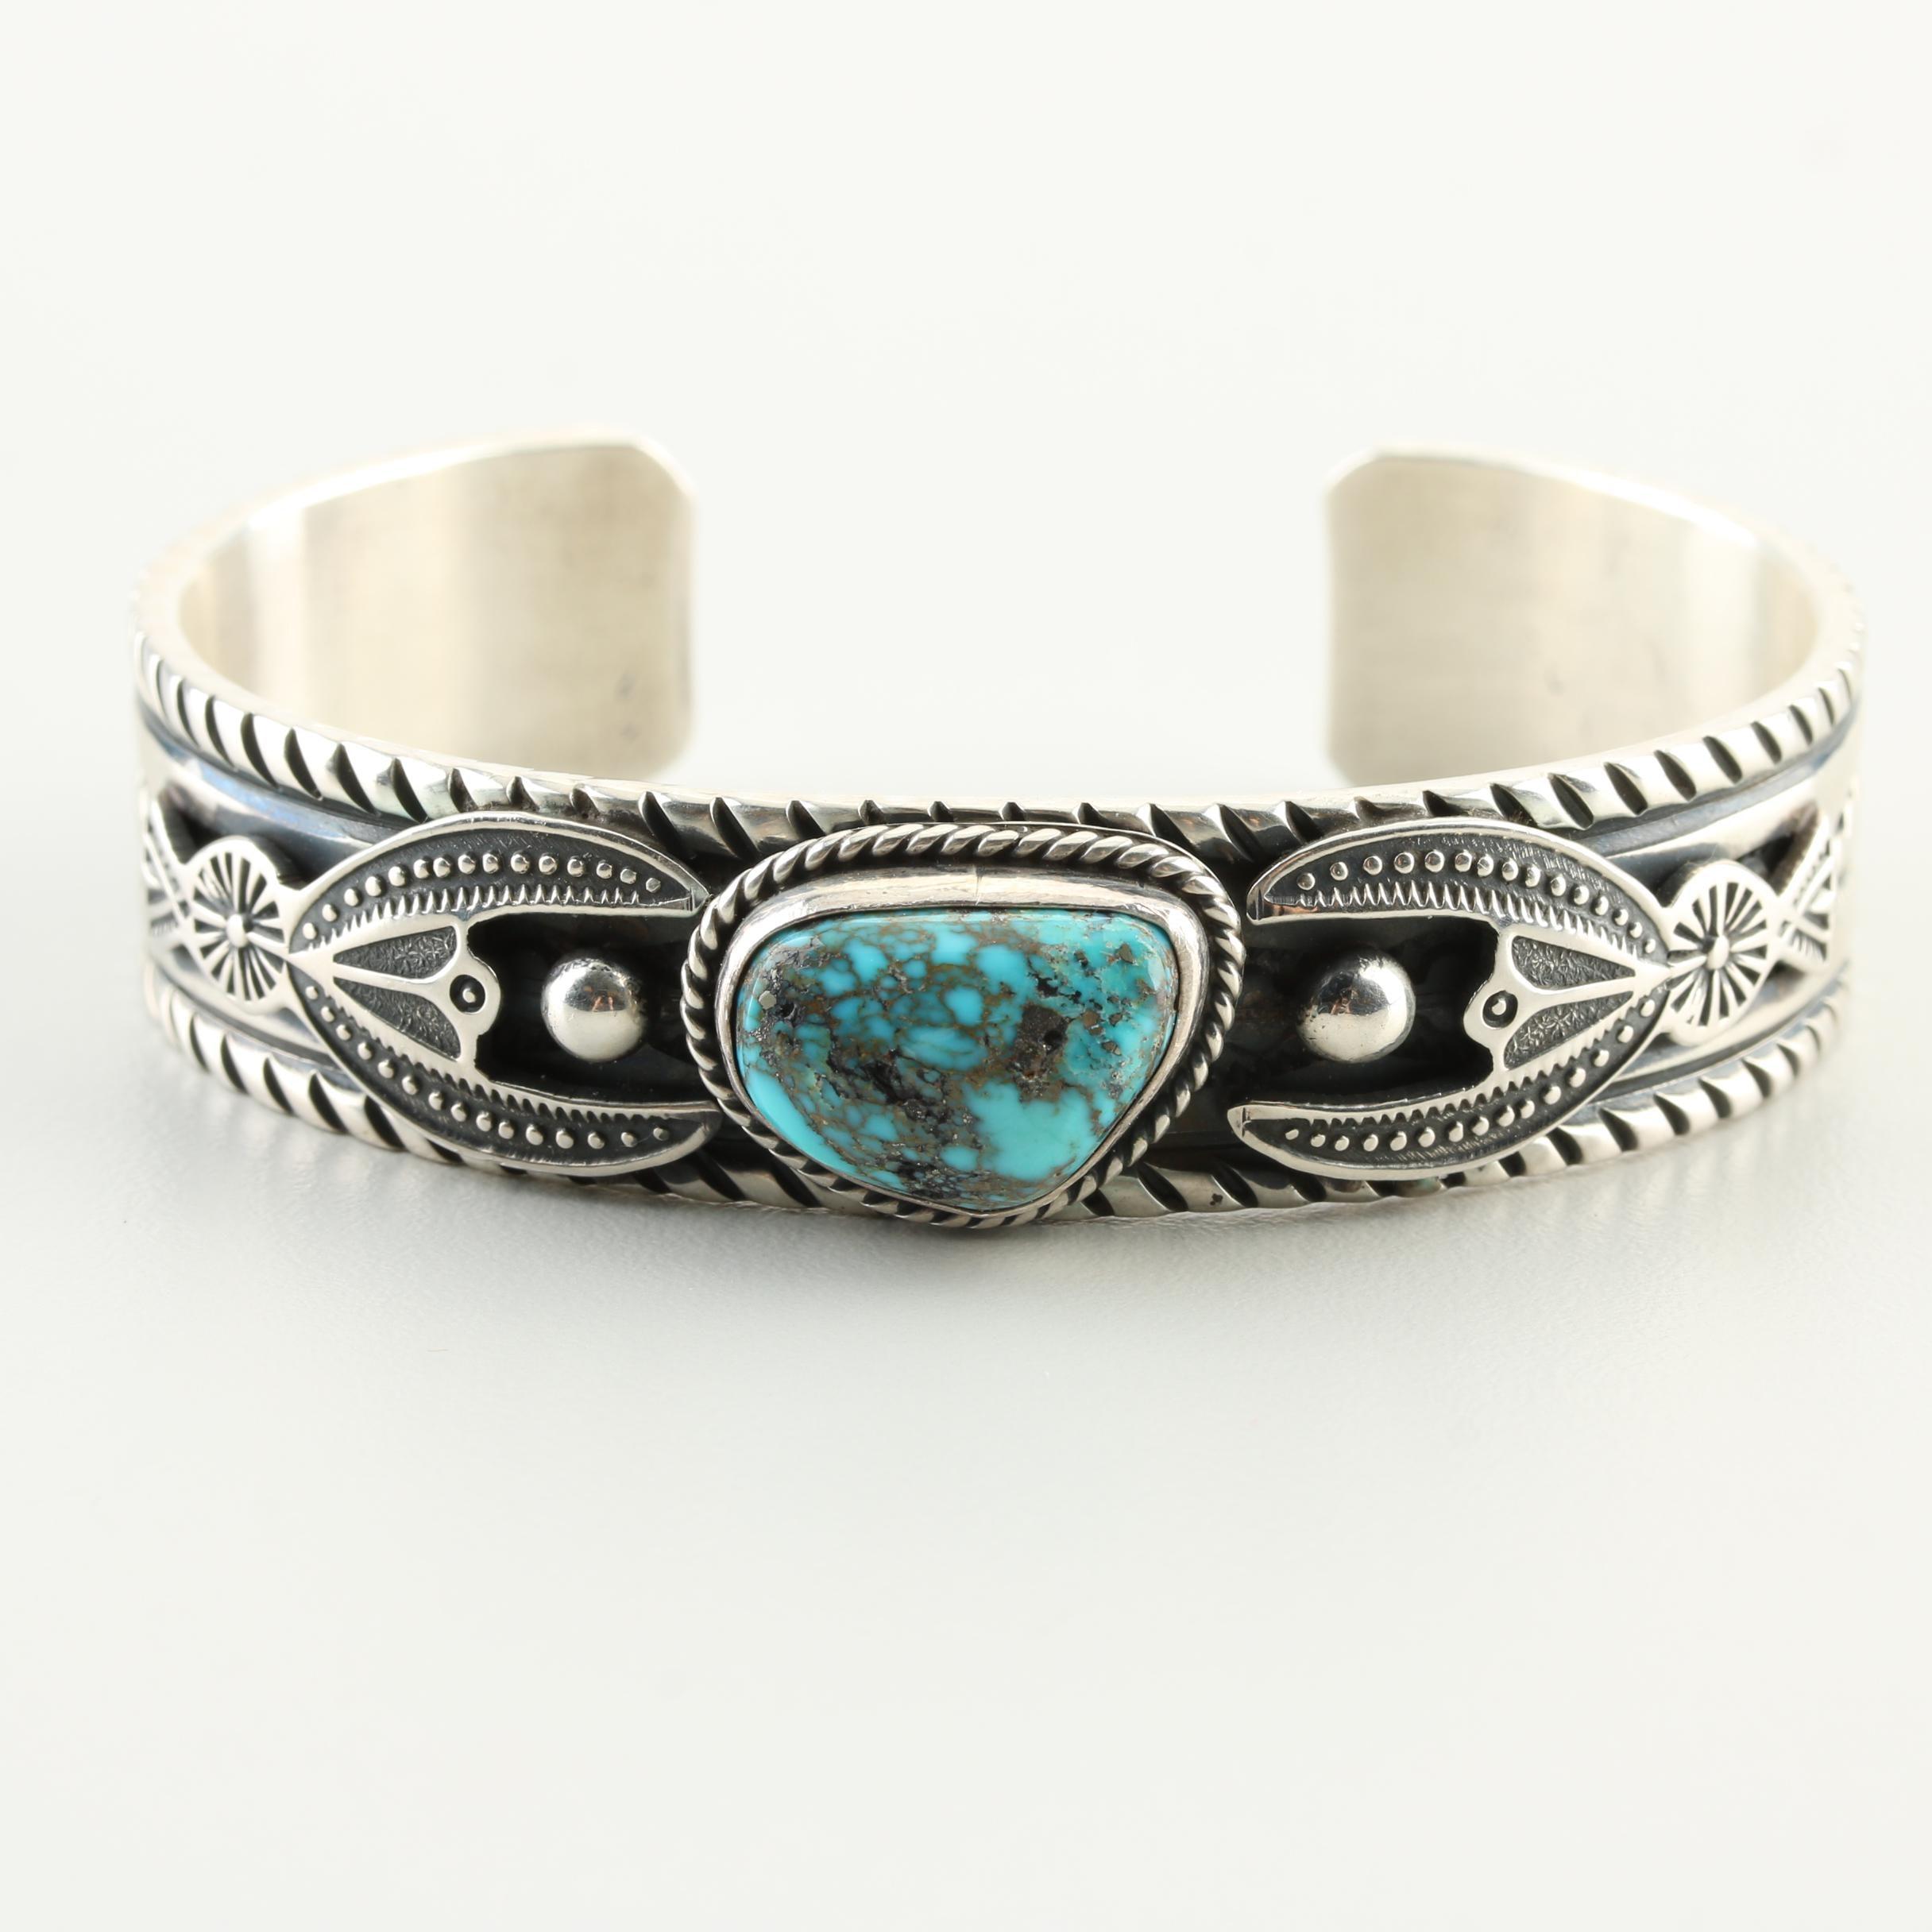 Albert Jake Navajo Diné Sterling Silver Turquoise Cuff Bracelet